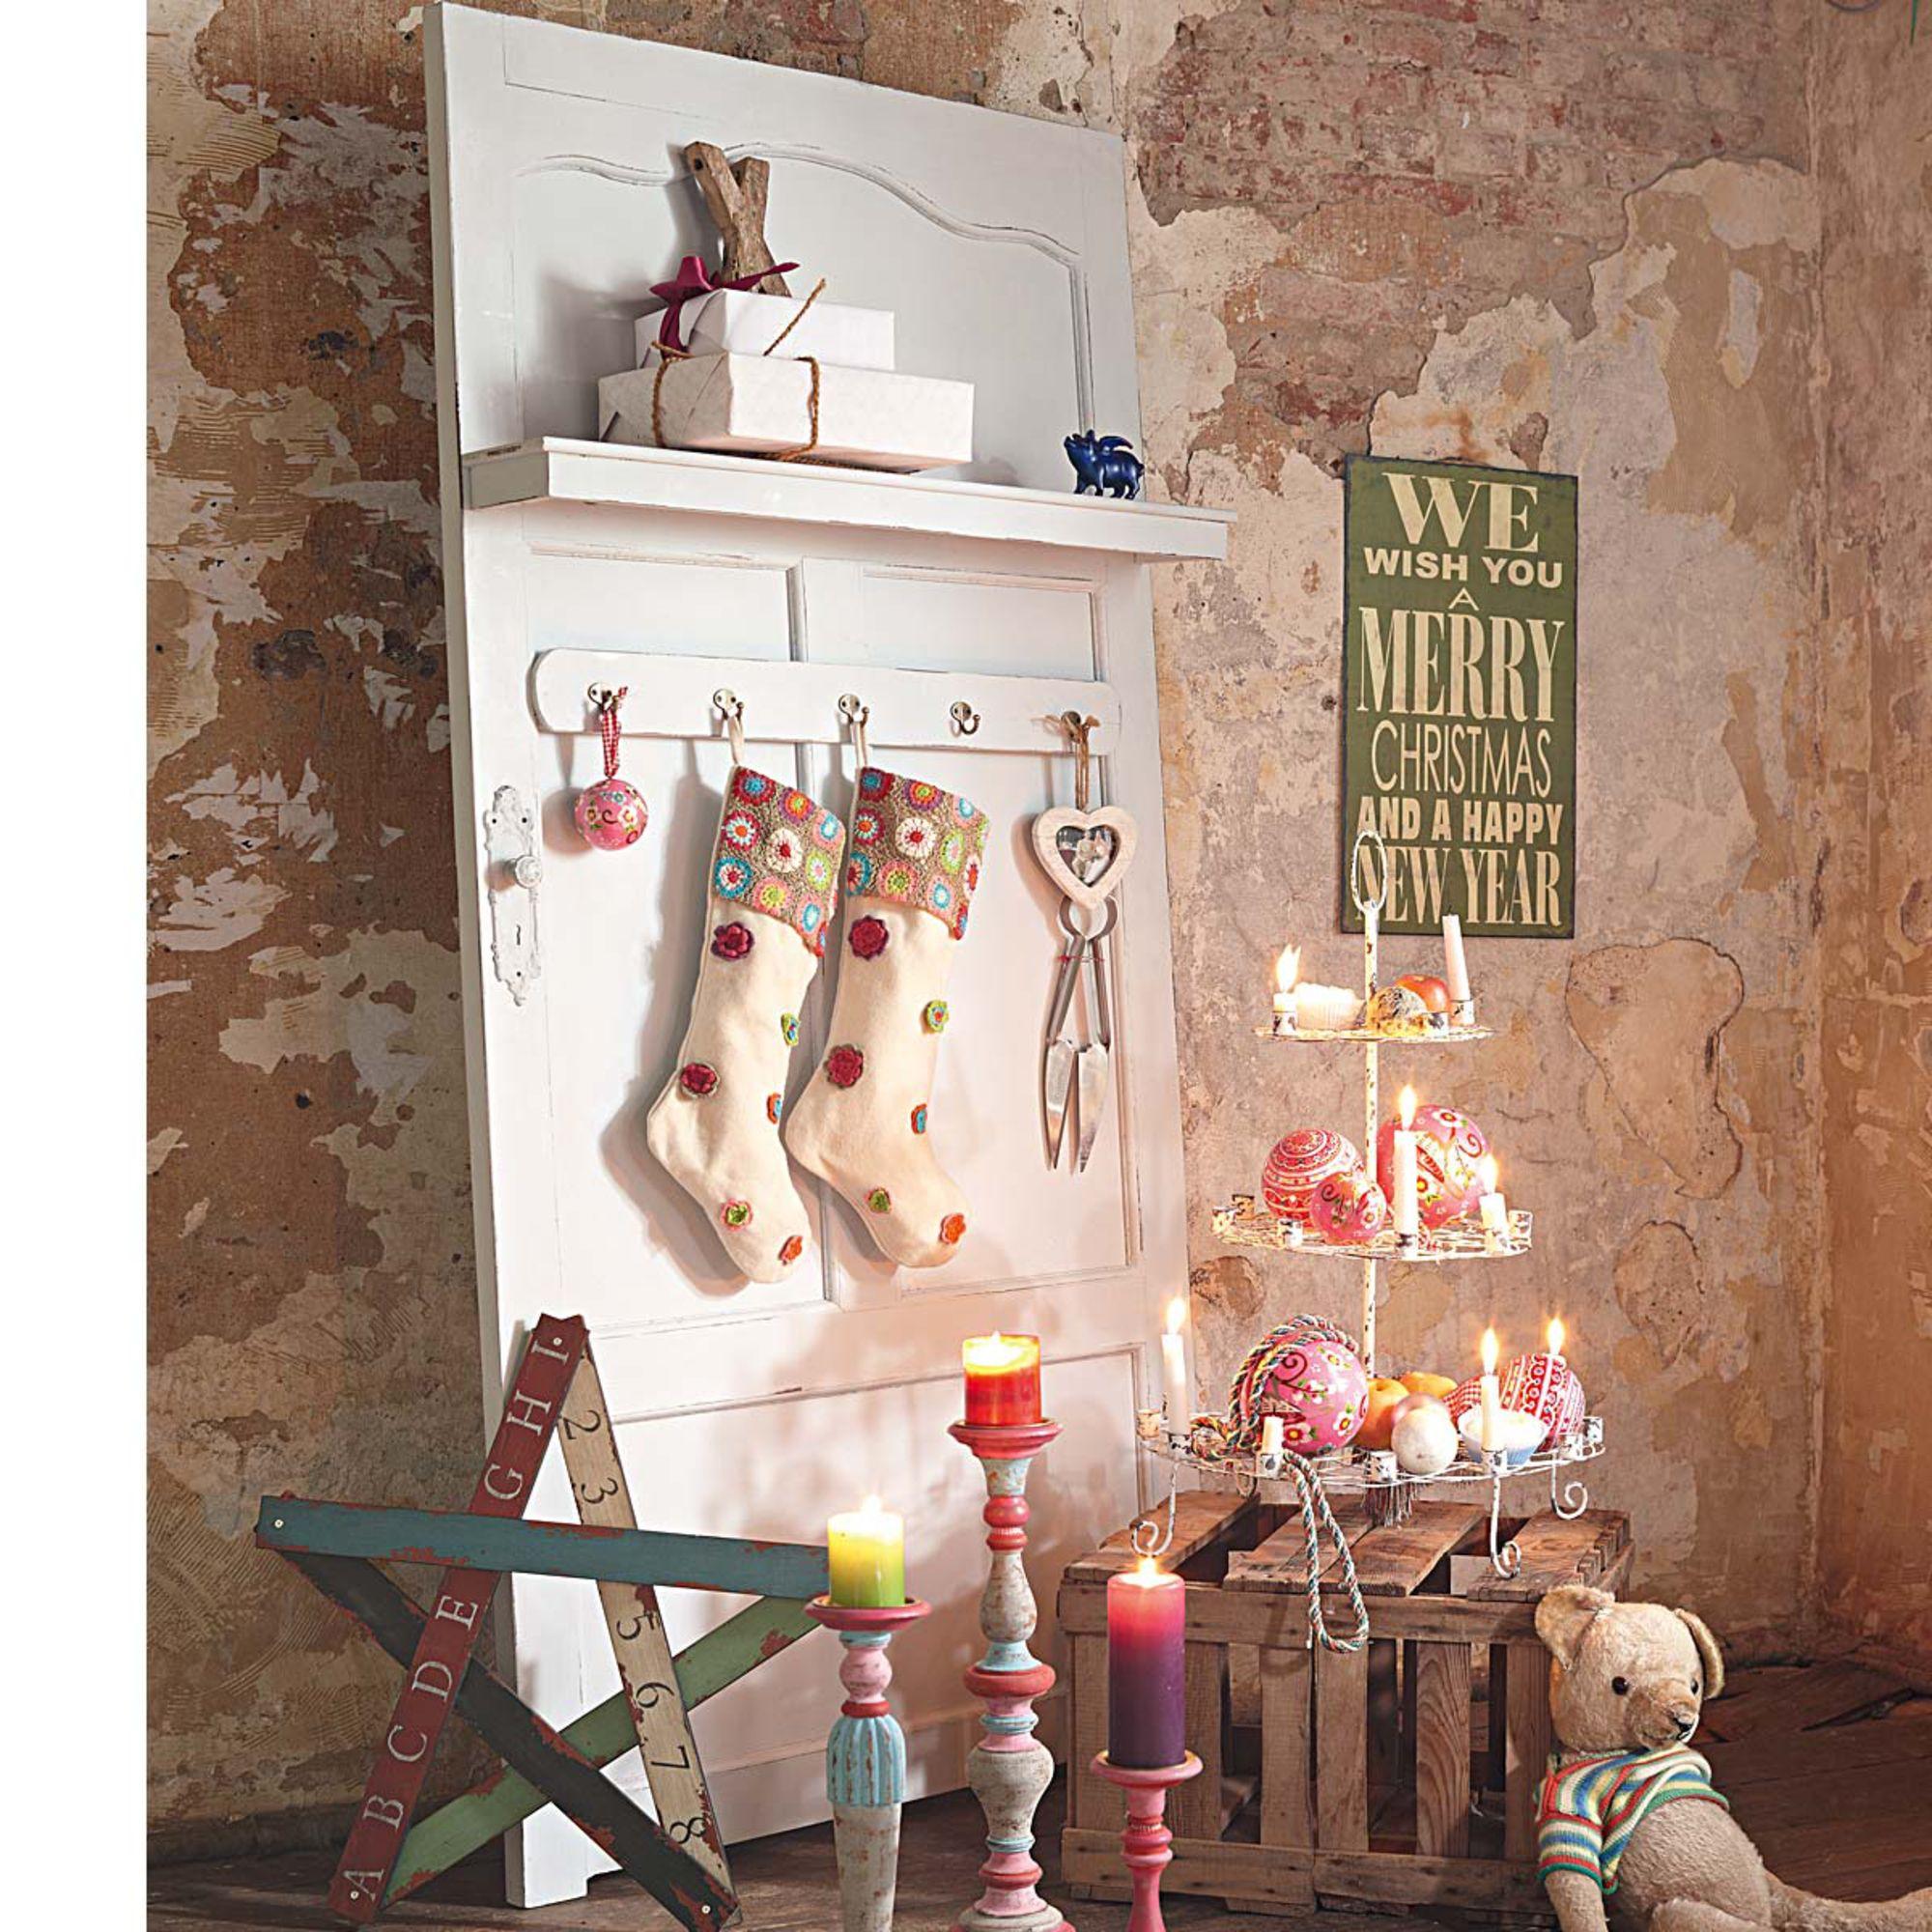 garderobe diy upcycling pinterest garderoben shops und flure. Black Bedroom Furniture Sets. Home Design Ideas